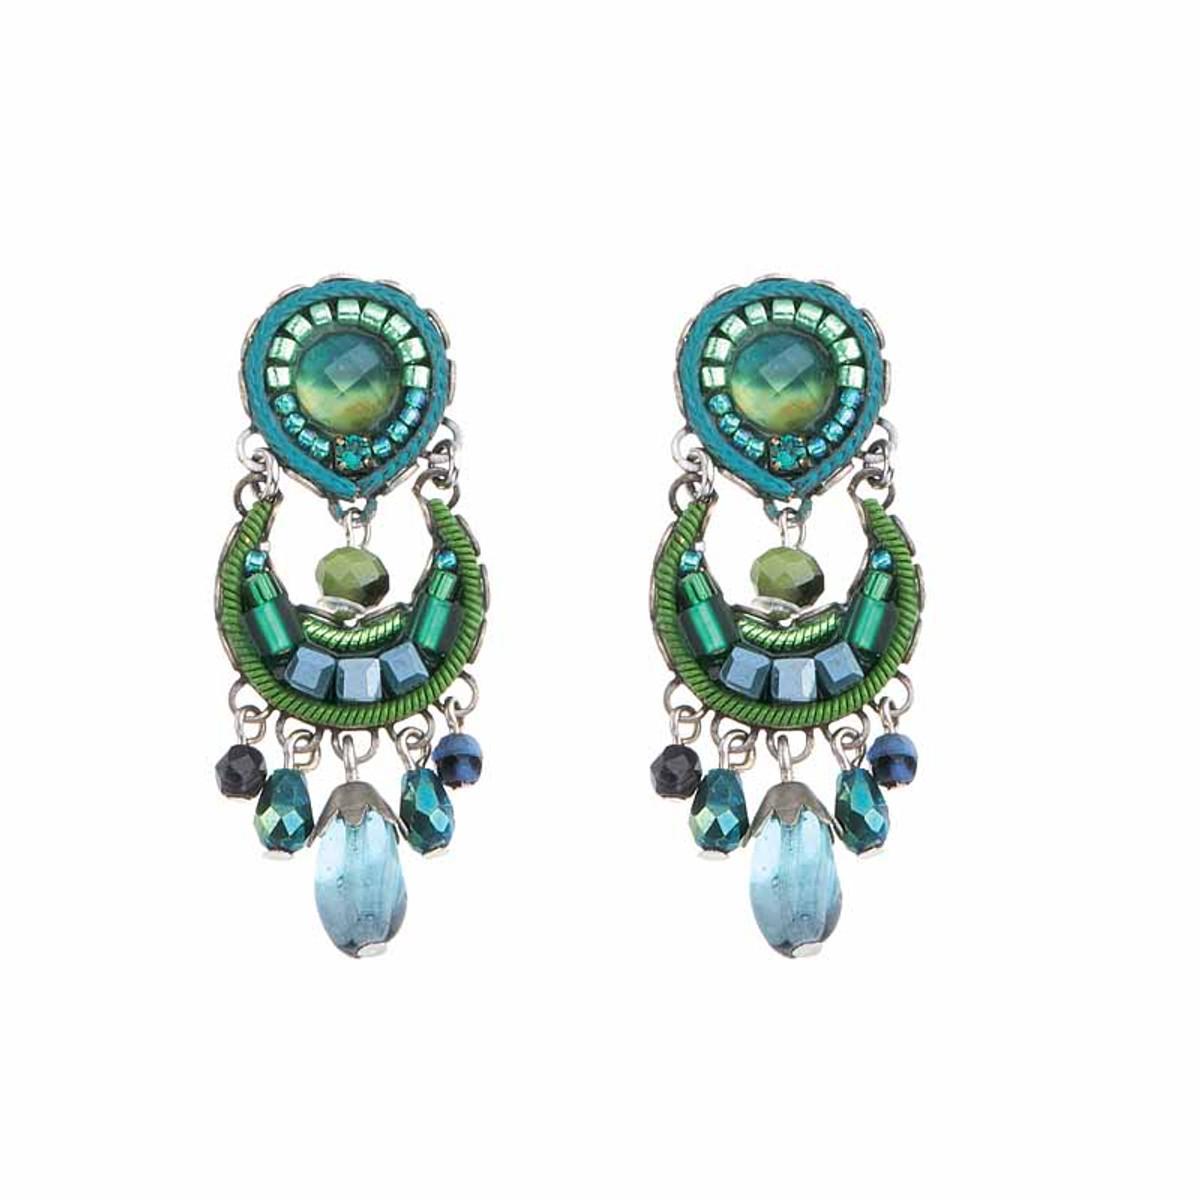 Ayala Bar Green River Crescent Moon Earrings